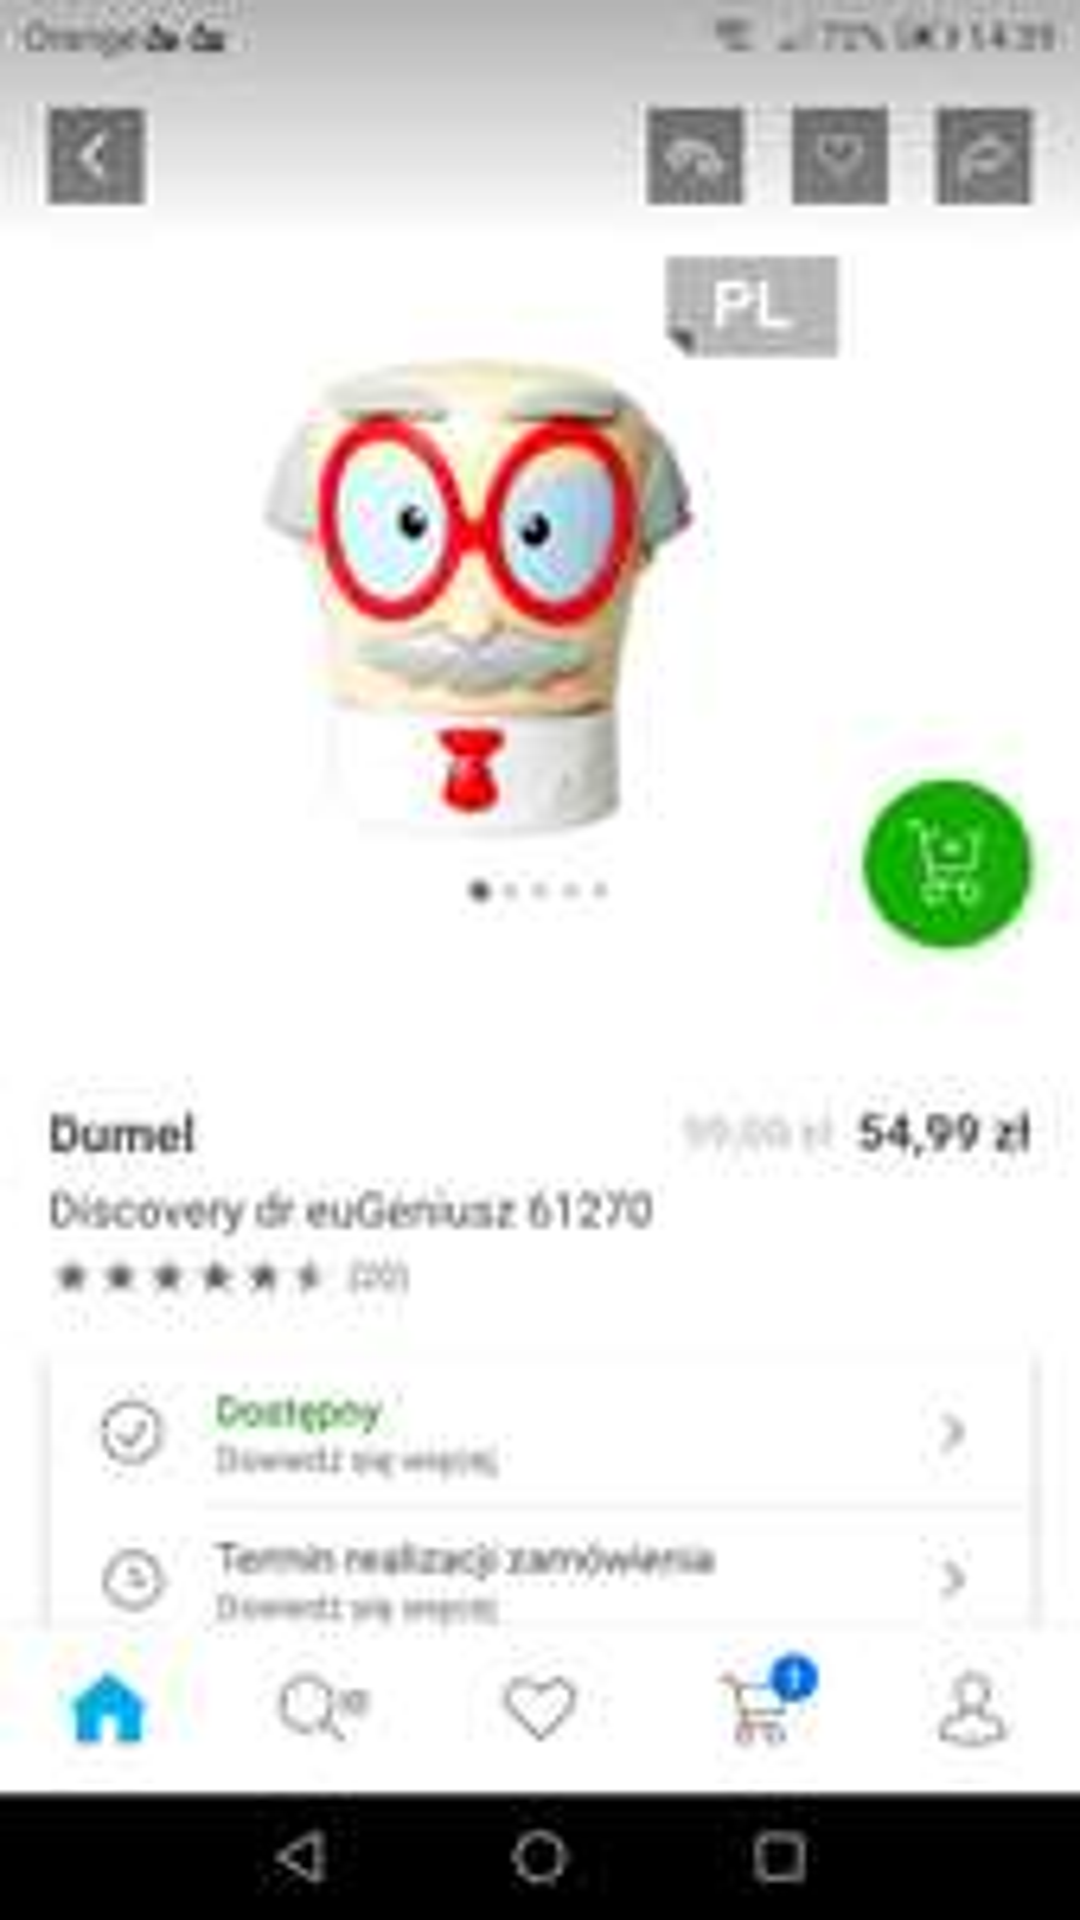 Dumel Discovery dr euGeniusz 61270